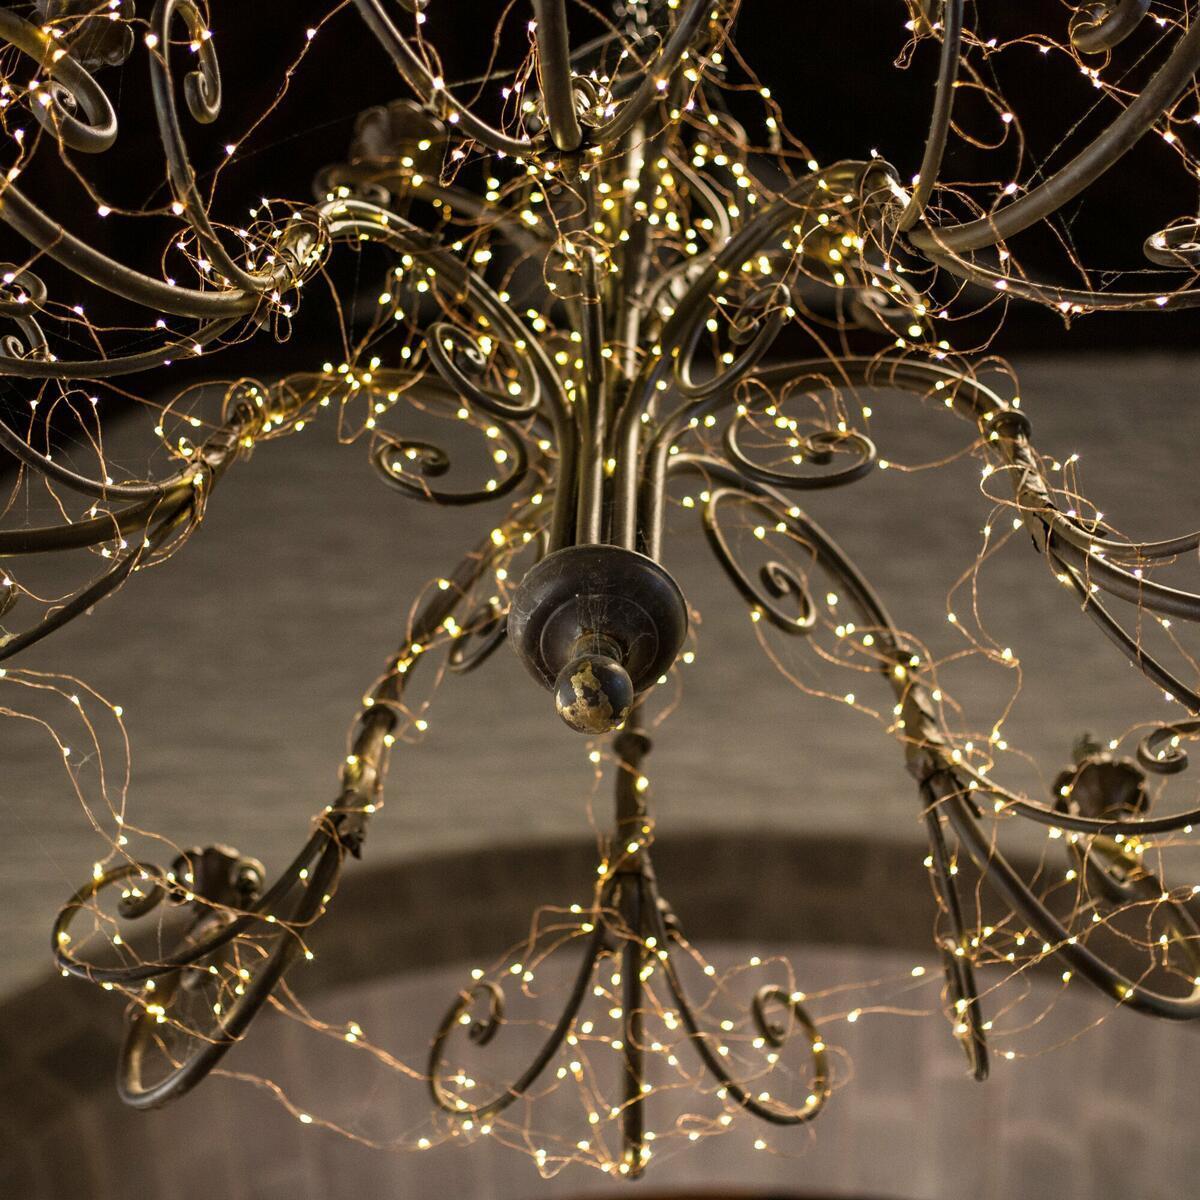 The Hub's wonderful chandelier